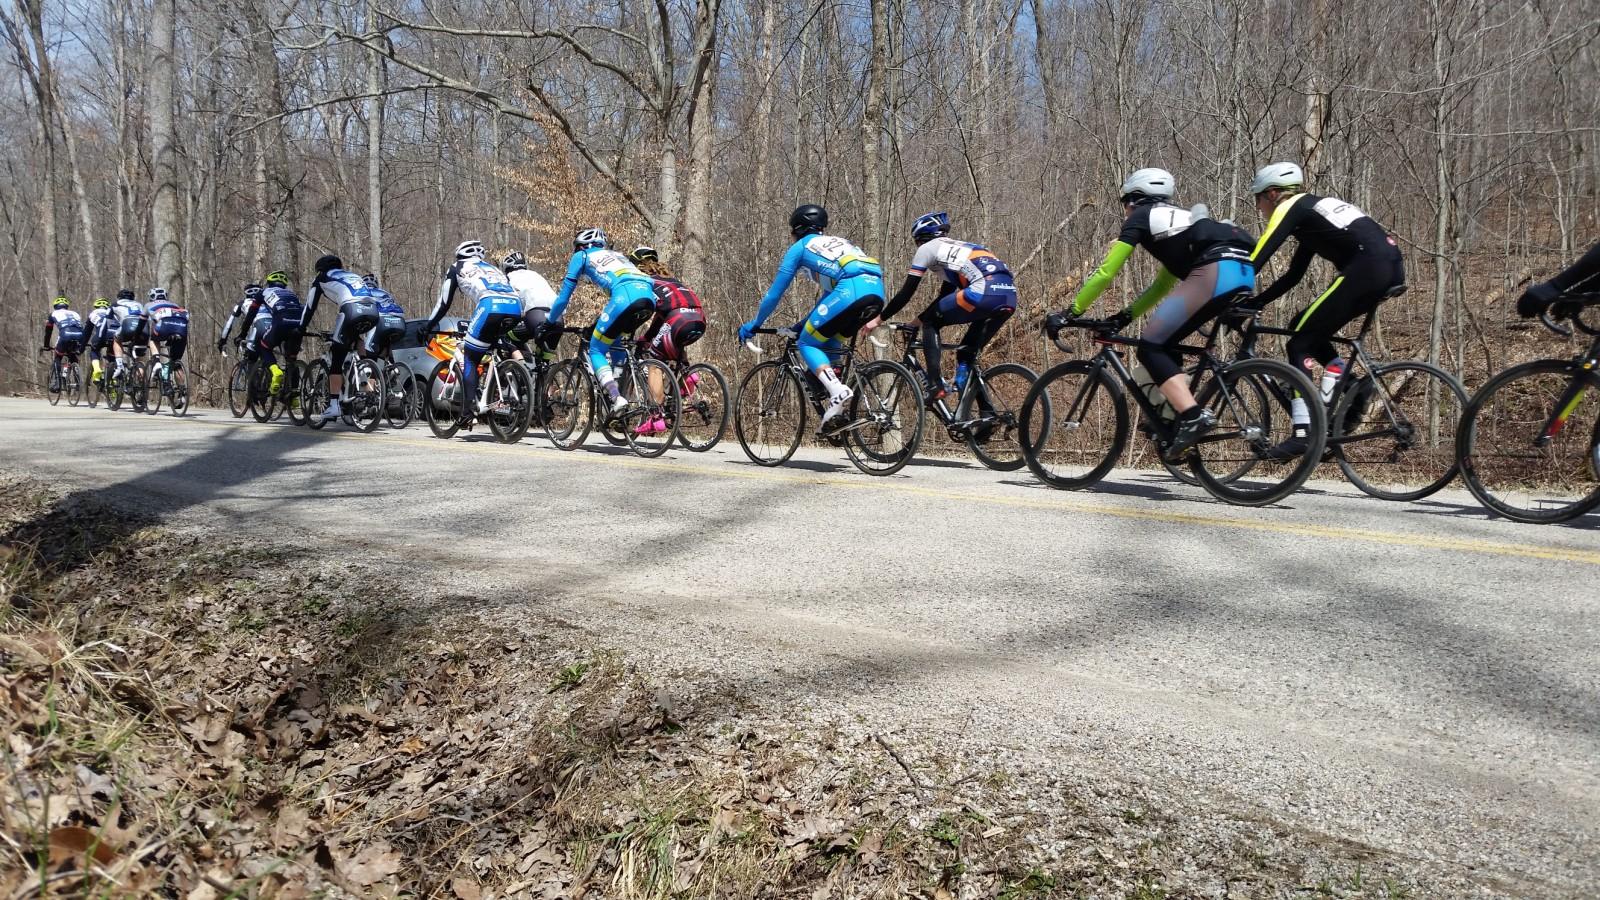 Lake Hope Bicycle Race 2015 - 4 - KD8WVX [Desktop Resolution]